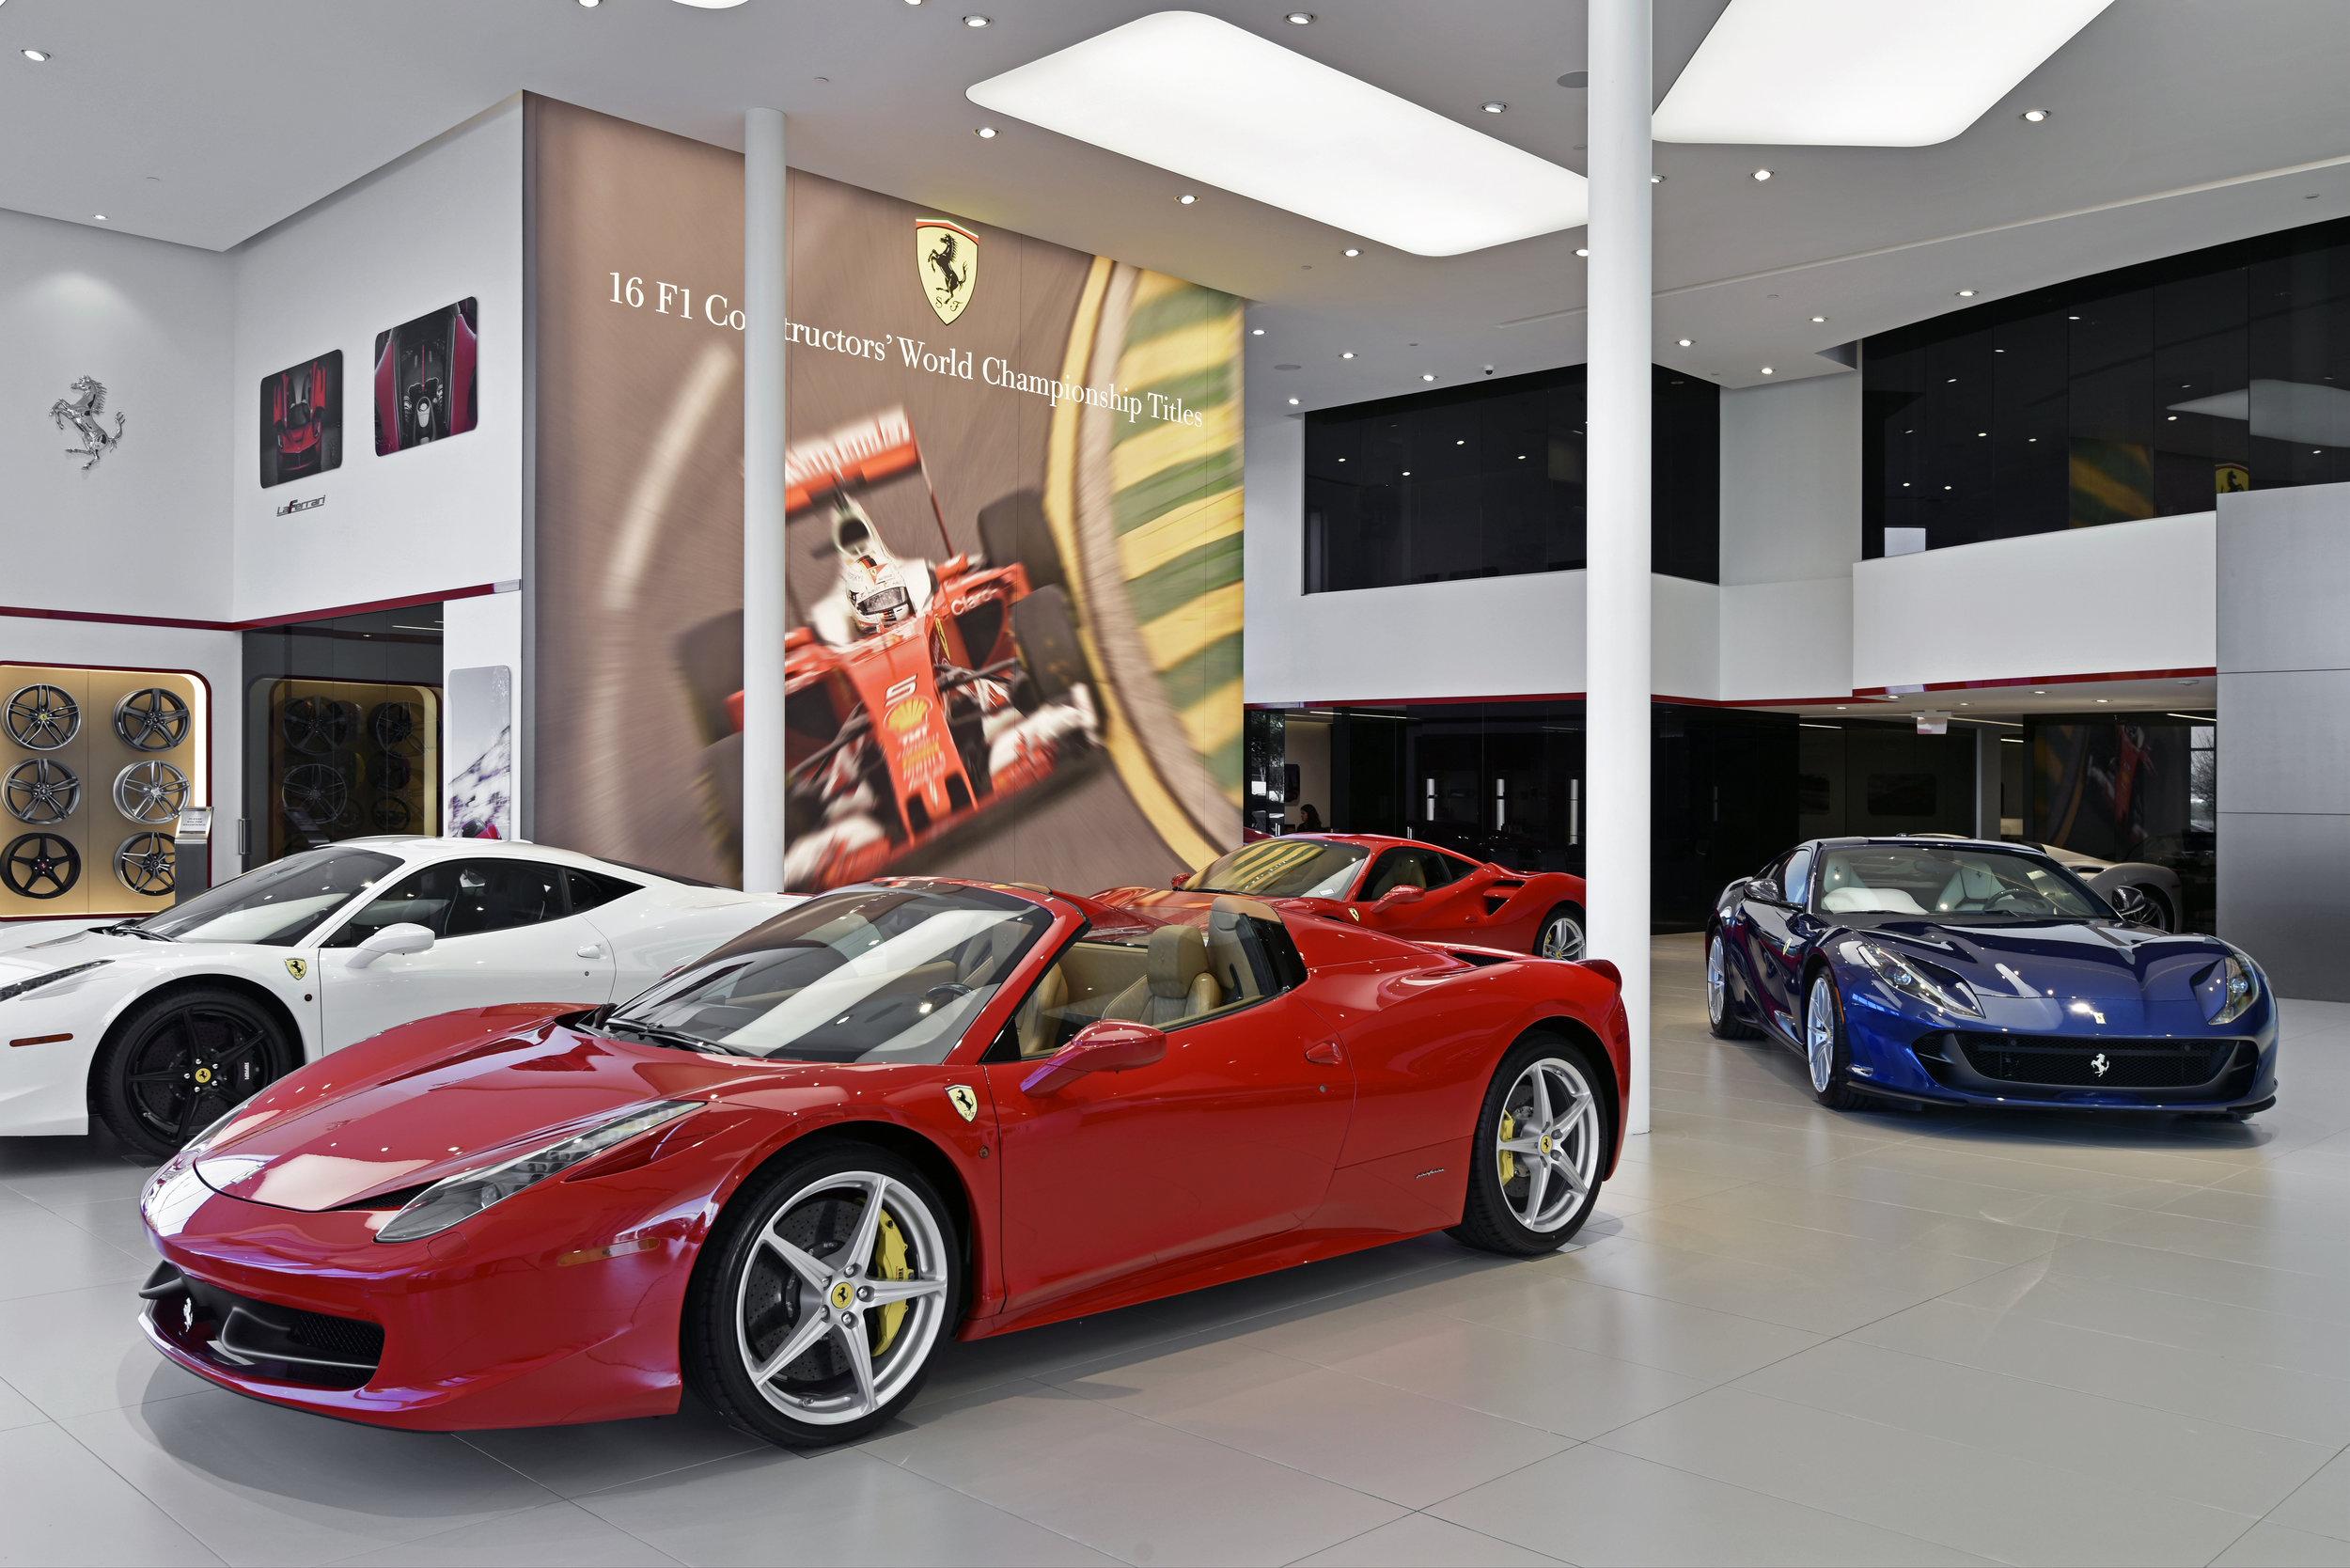 Boardwalk Ferrari, Plano, TX